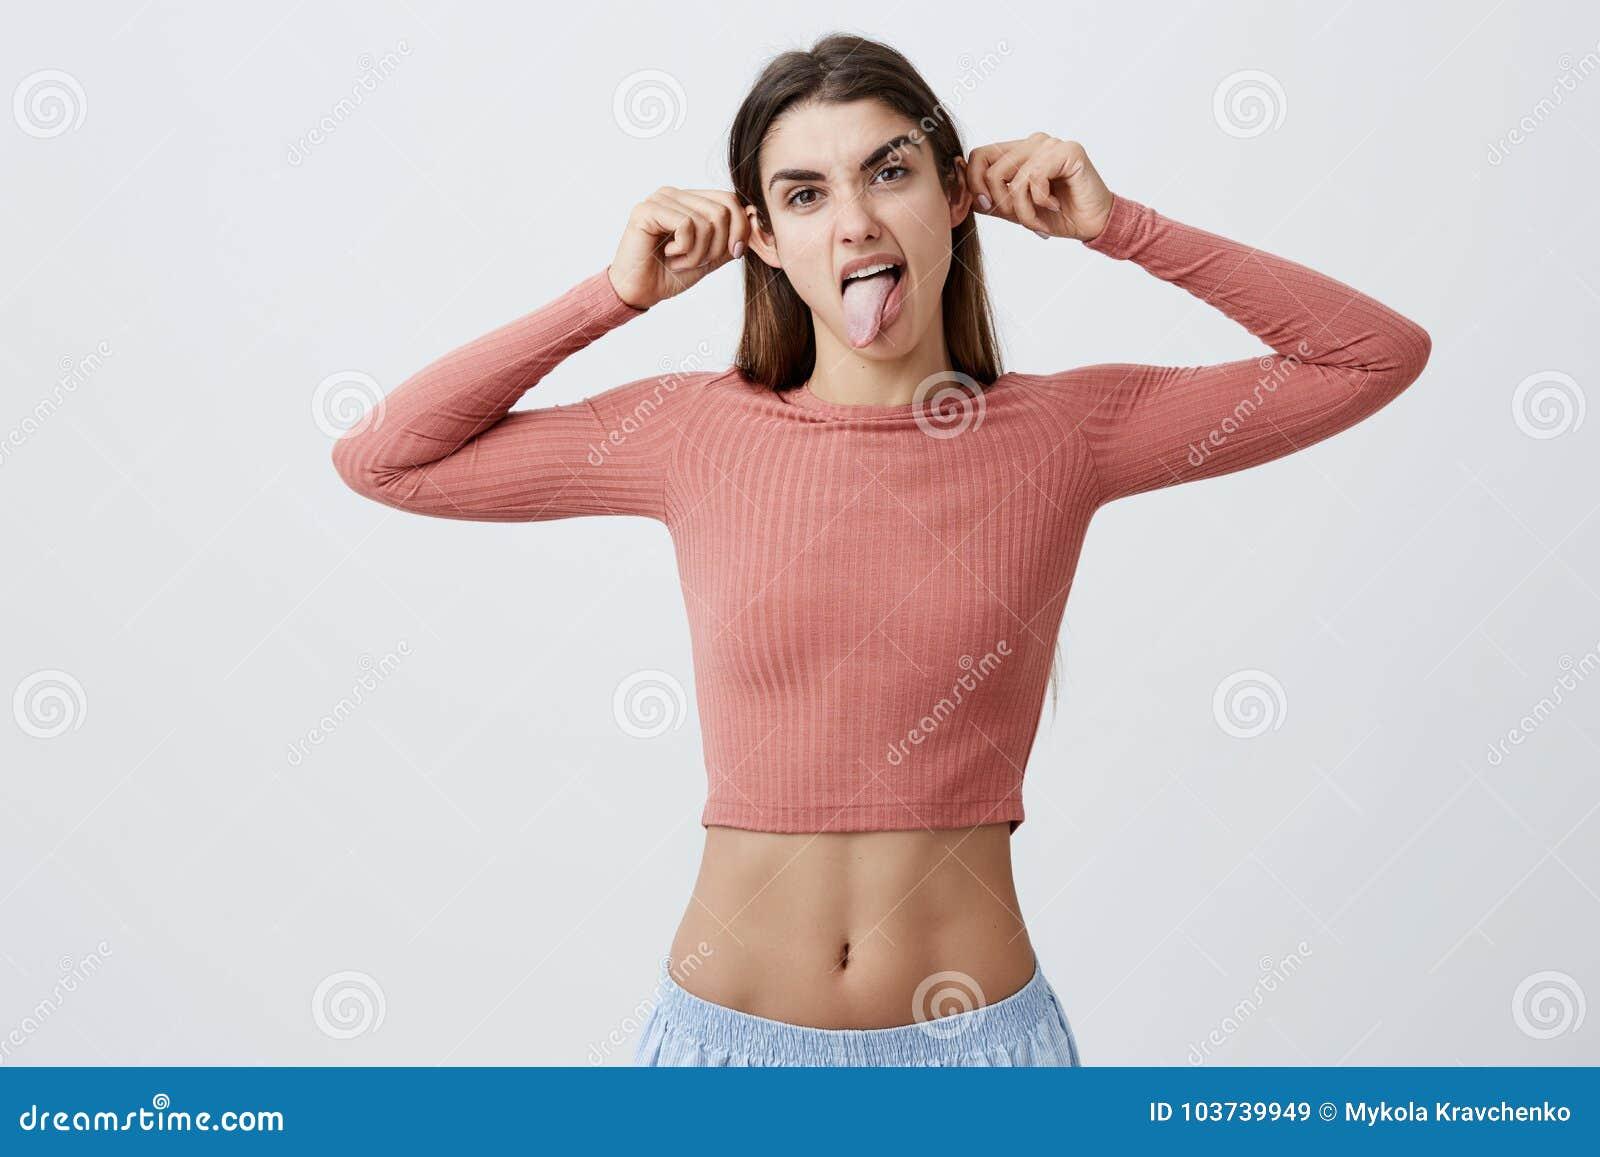 Nude milf nice hips